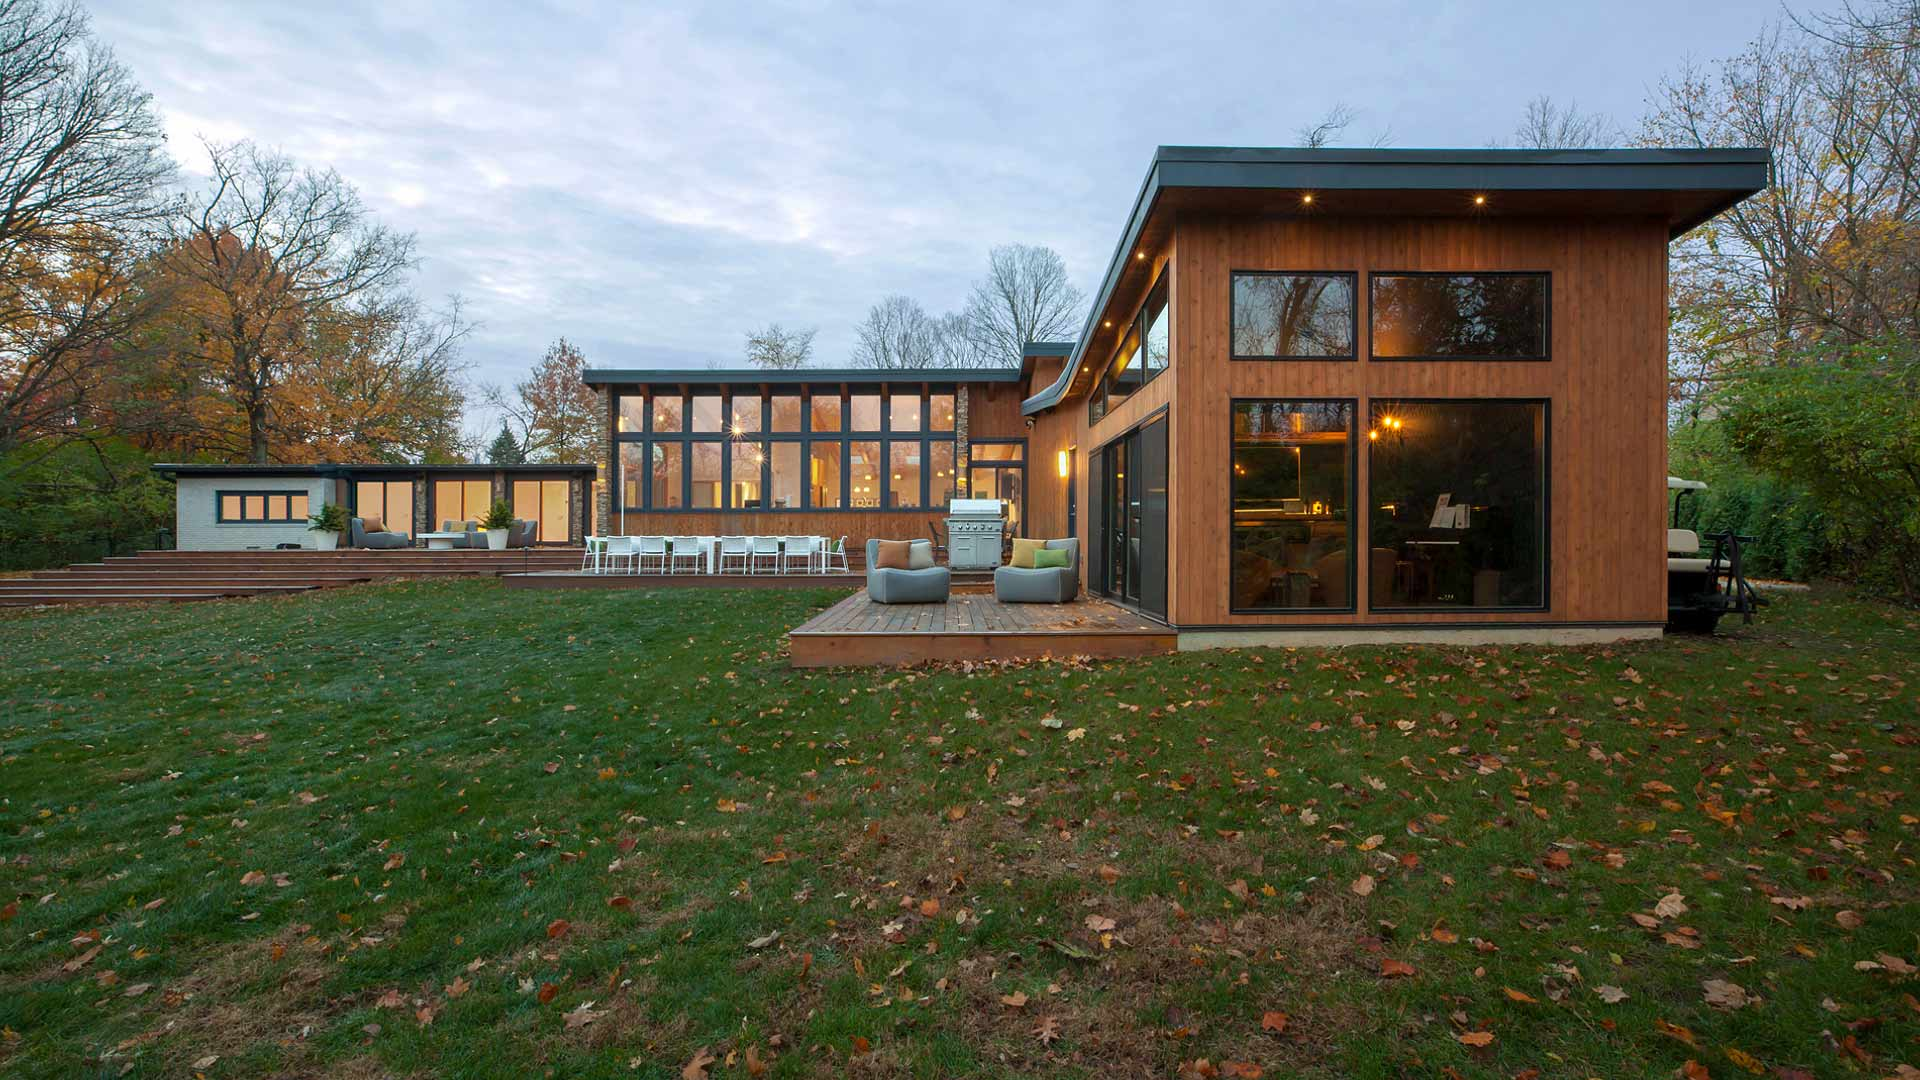 Rear Exterior Elevation - Cigar Room Addition - Shed Roofs - Cedar Siding - Midcentury Modern Addition (Cigar Room) - Brendonwood, Indianapolis